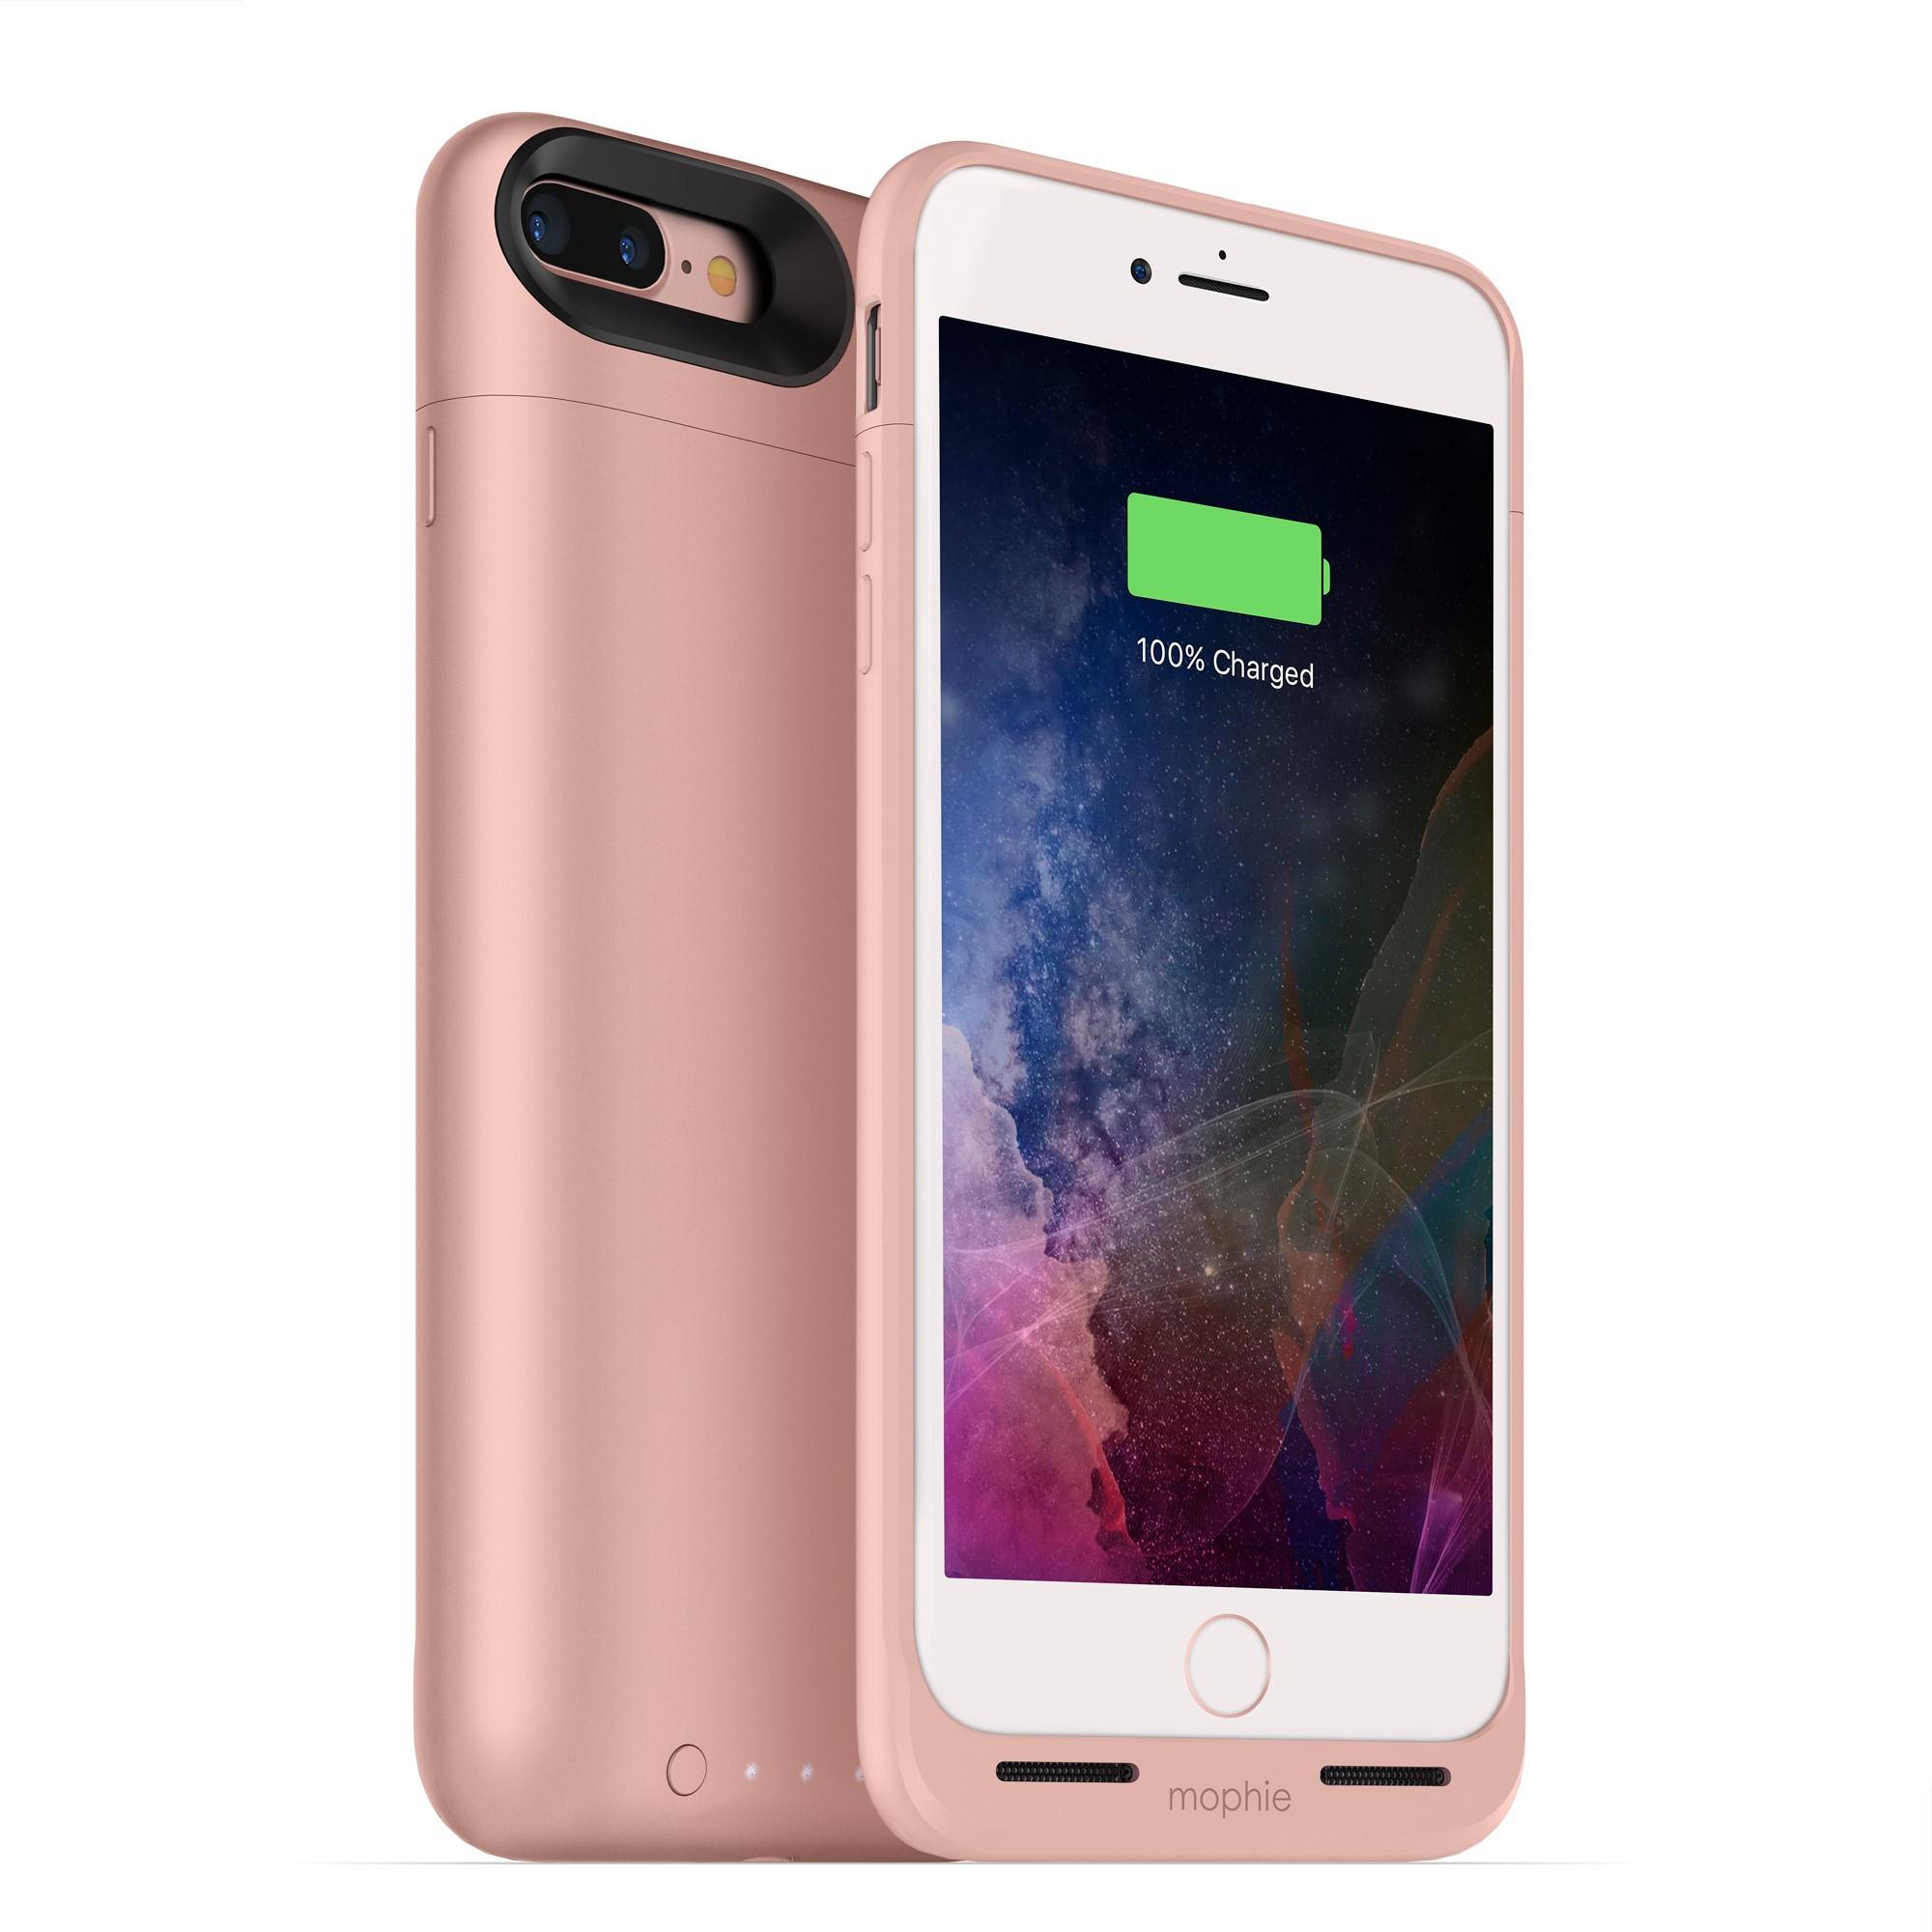 Nabíjecí pouzdro pro Apple iPhone 7 PLUS / 8 PLUS - Mophie, Juice Pack Air 2420mAh Rose Gold